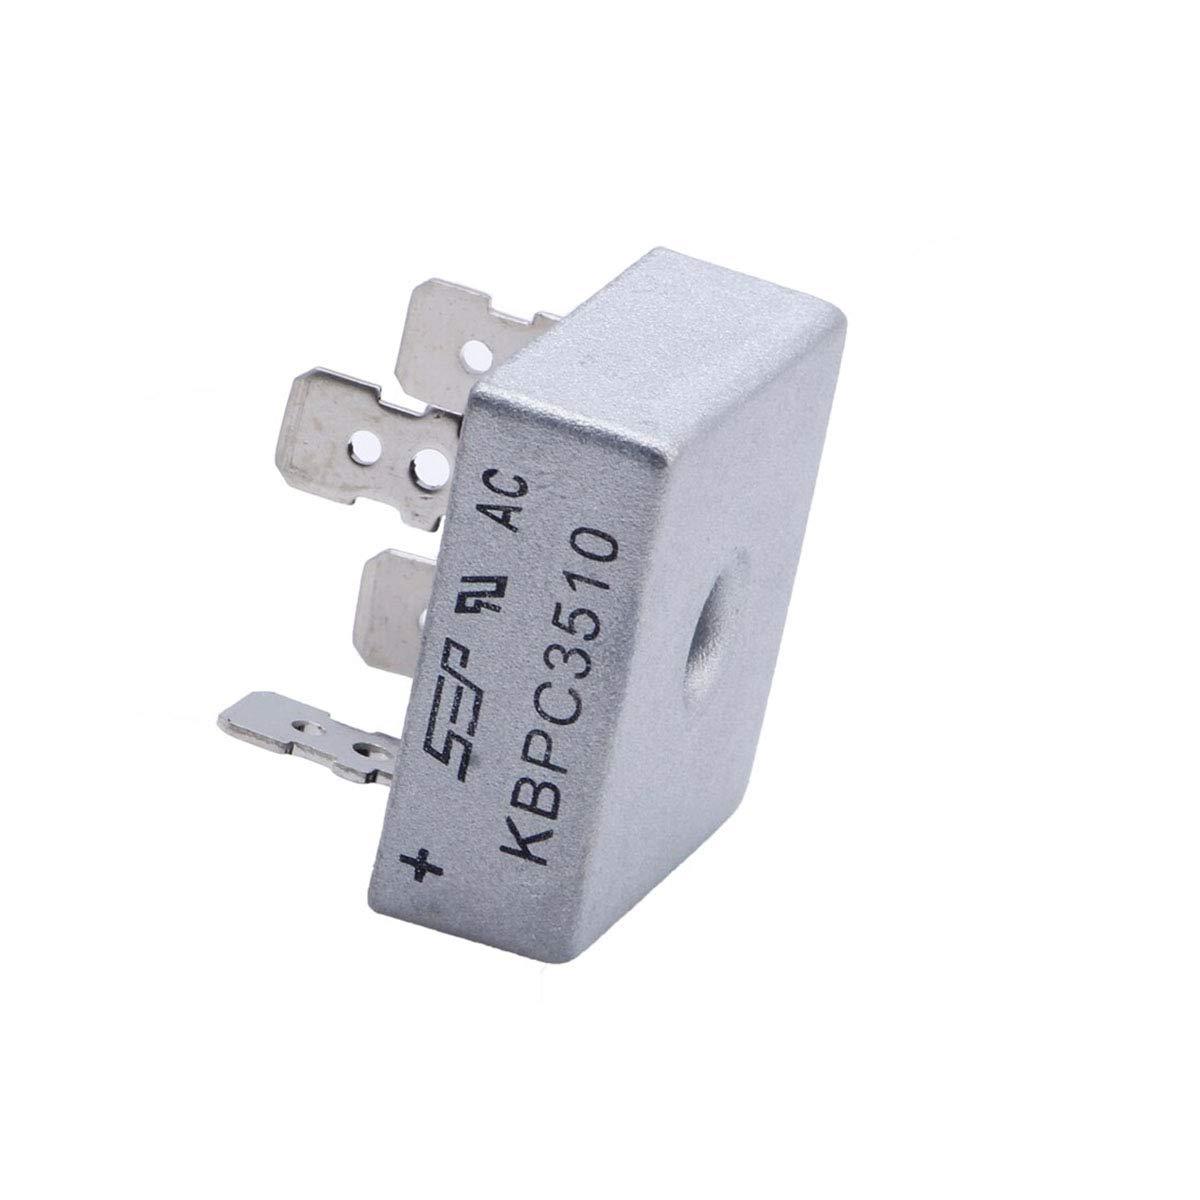 KBPC3510 35A 1000V Bridge Rectifier Diode Single Phase Metal Case Diode Bridge Rectifier 4-Pin 5Pcs